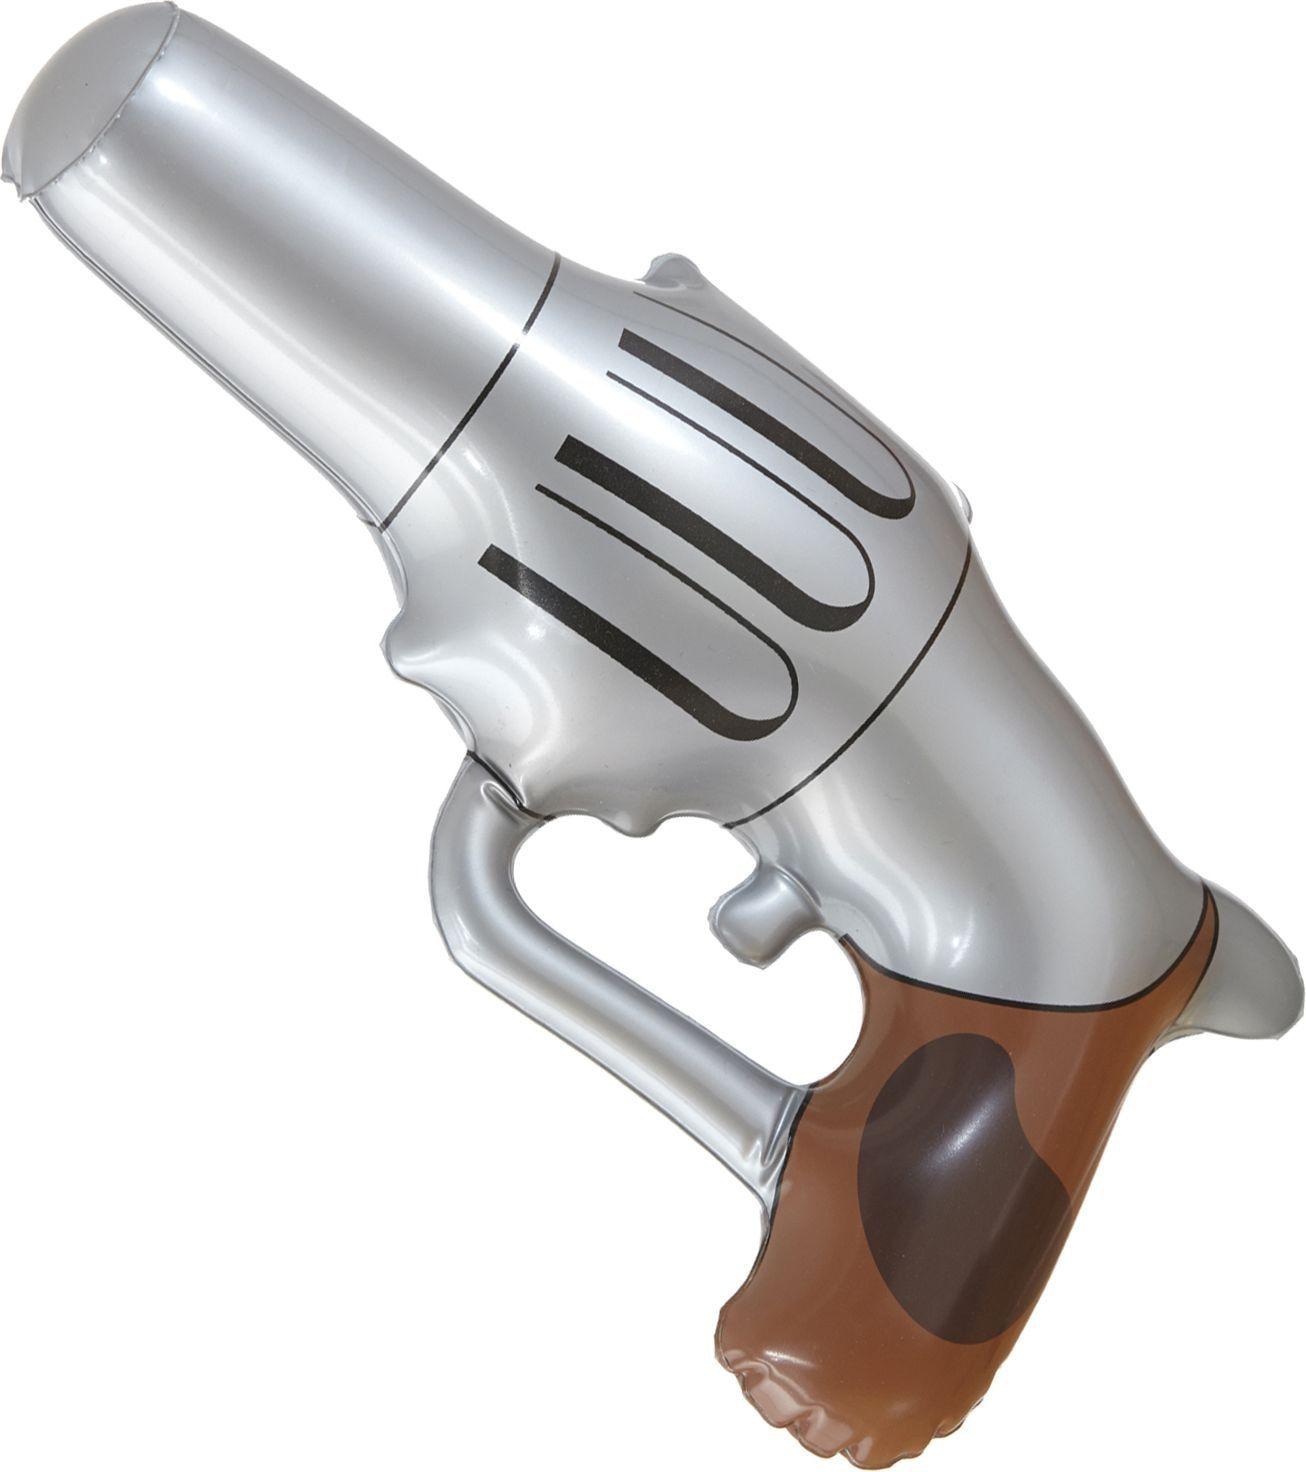 Opblaasbaar cowboy pistool